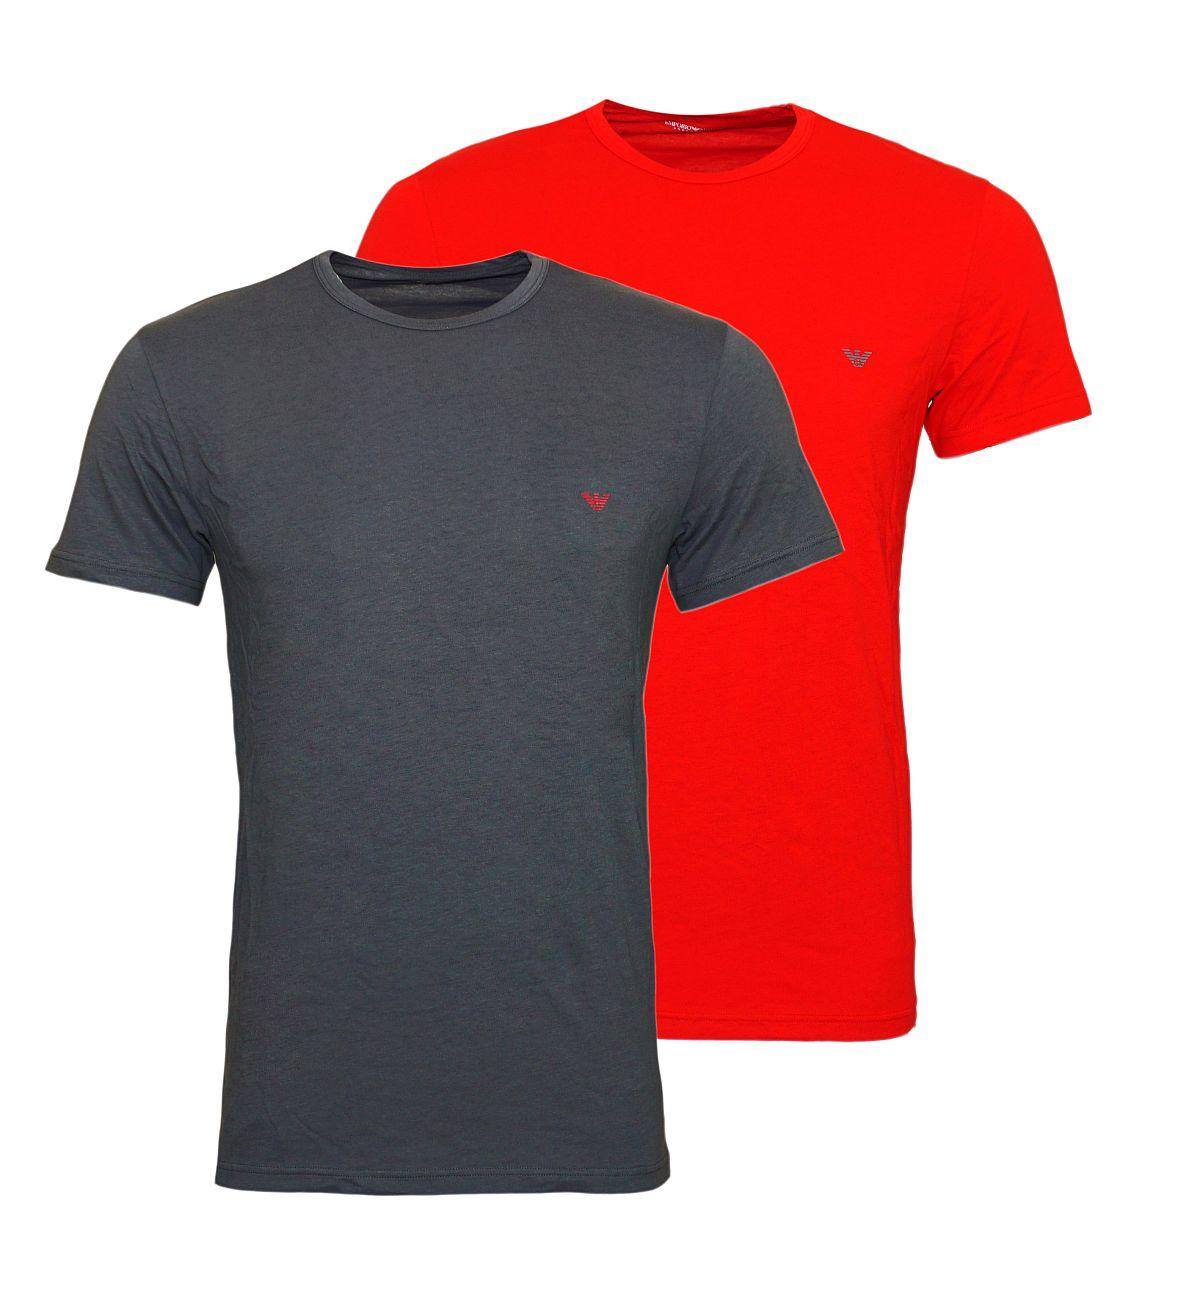 Emporio Armani 2er Pack T-Shirt Rundhals 111267 8A722 21544 ANTRACITE/RUBINO WX18-EAT